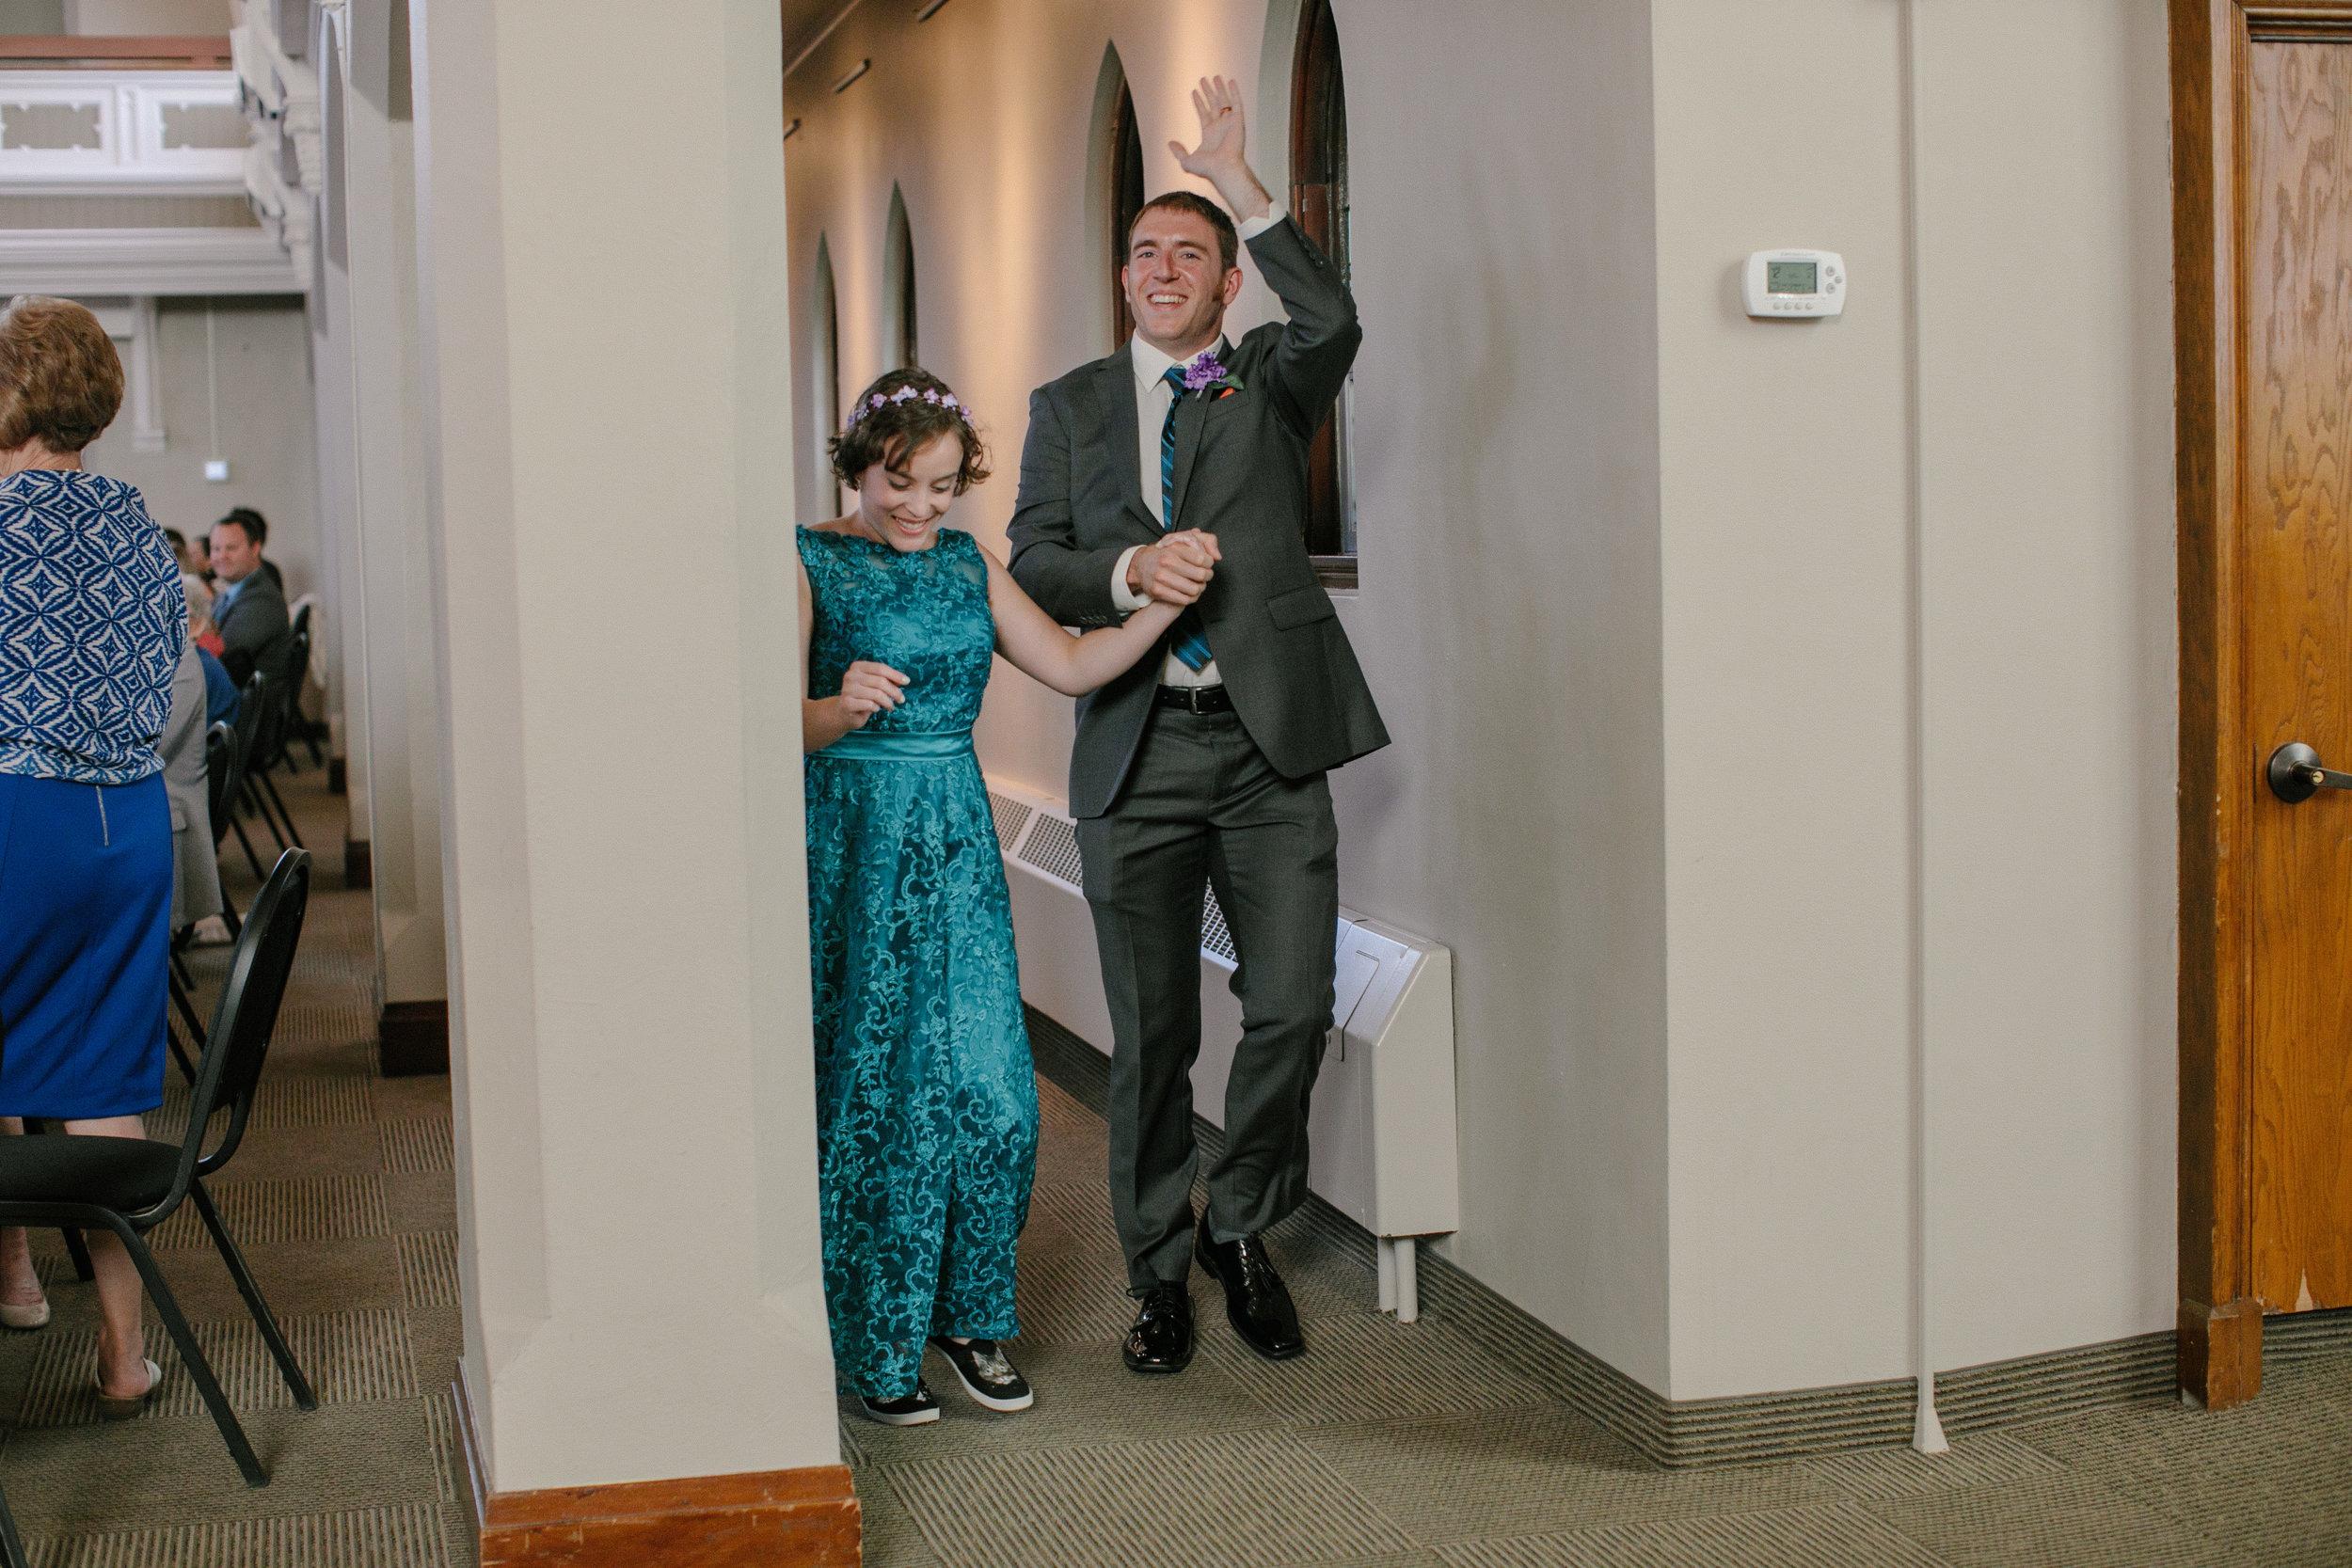 Rosemount_Steeple_Center_MN_Wedding-Photography-270.jpg